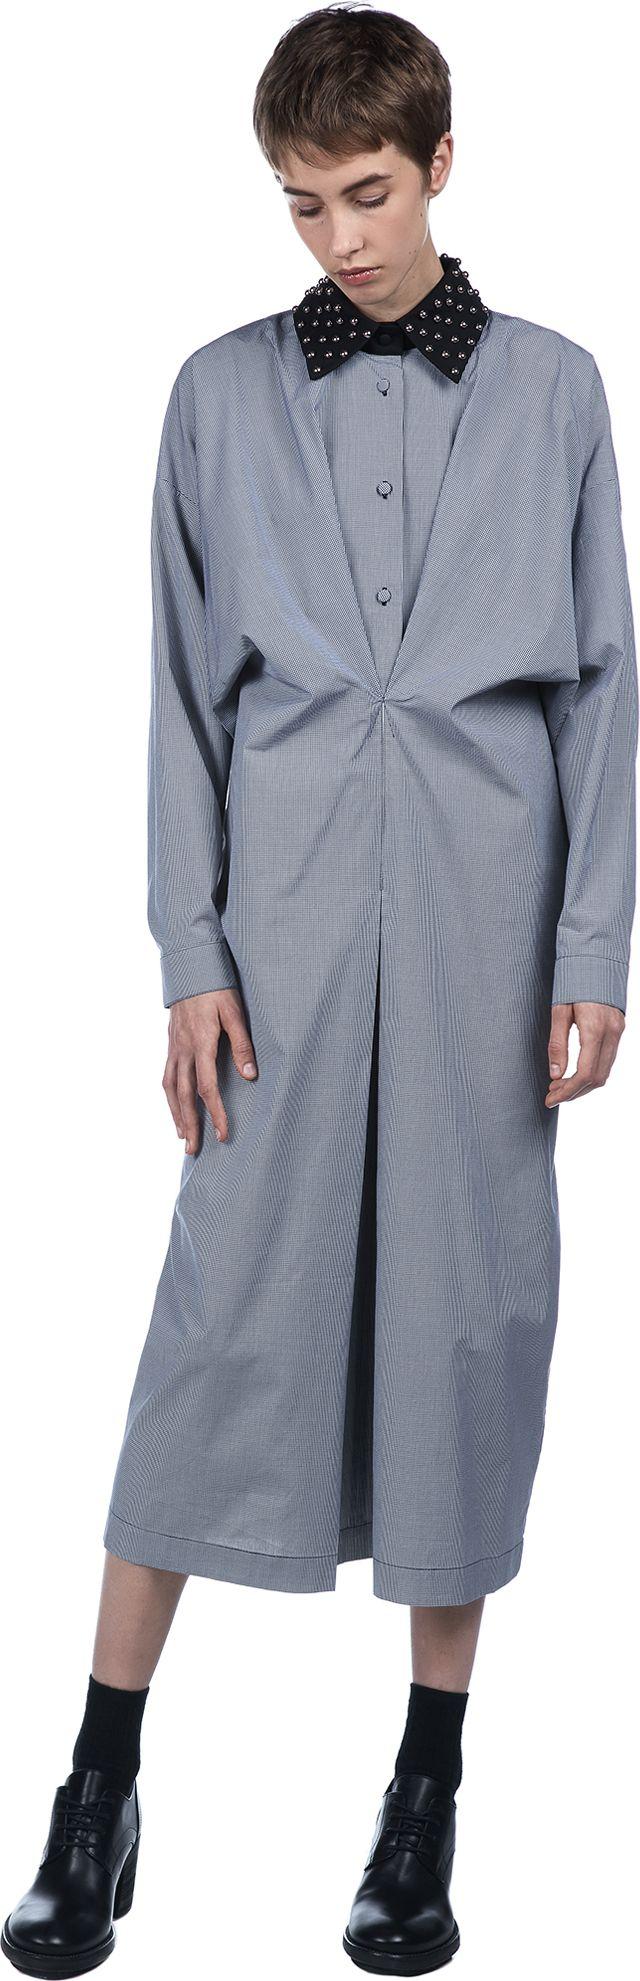 Studded Collar Gathered Shirt Dress | J.W.Anderson | LOIT